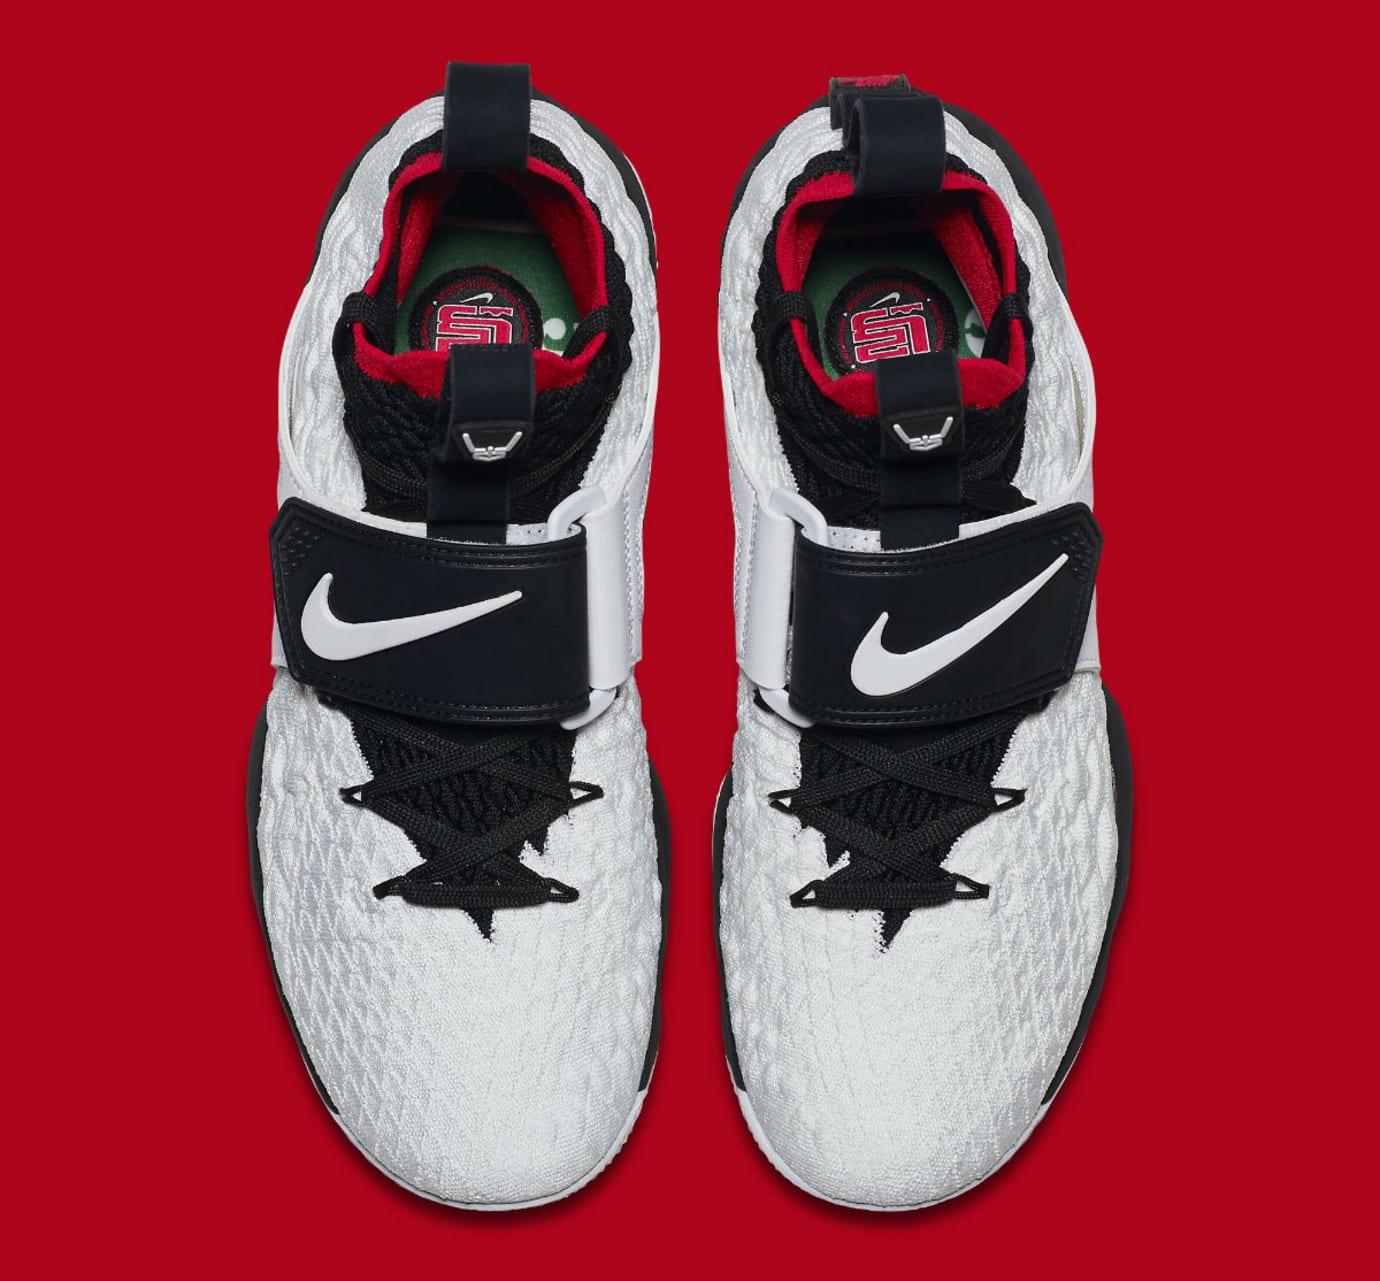 Nike LeBron 15 Diamond Turf Release Date AO9144-100 Top